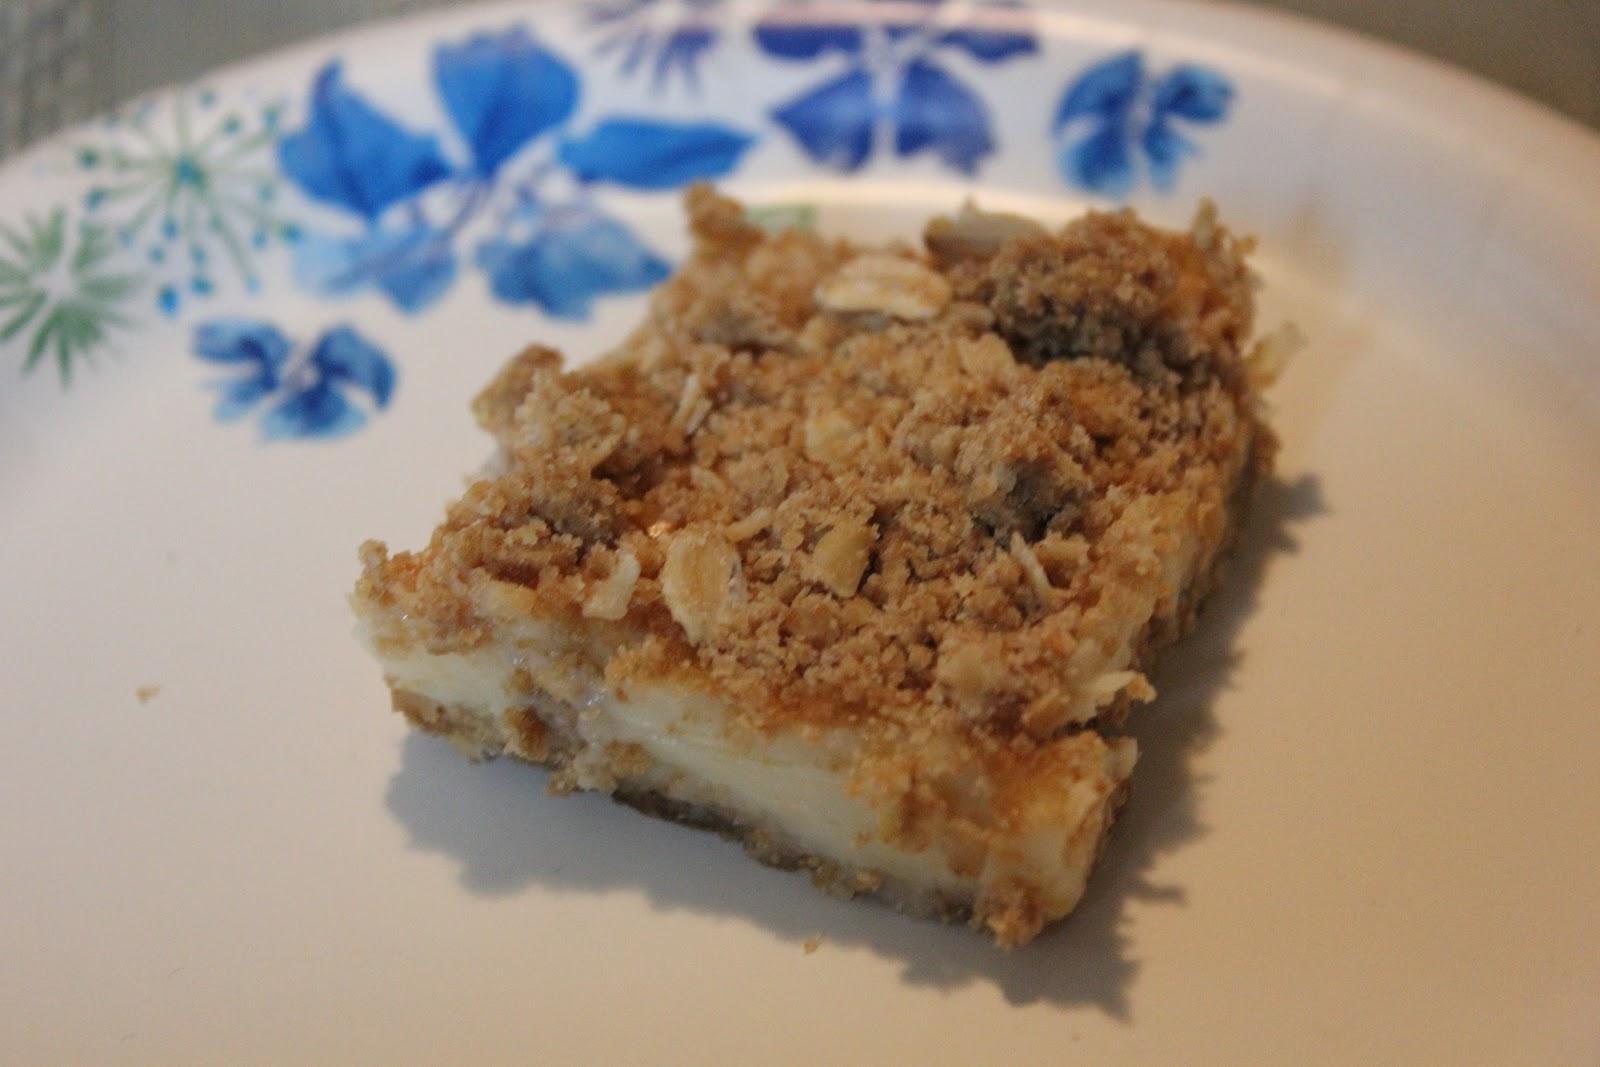 THE BUSY MOM CAFE: Lemon Cream Crumb Bars